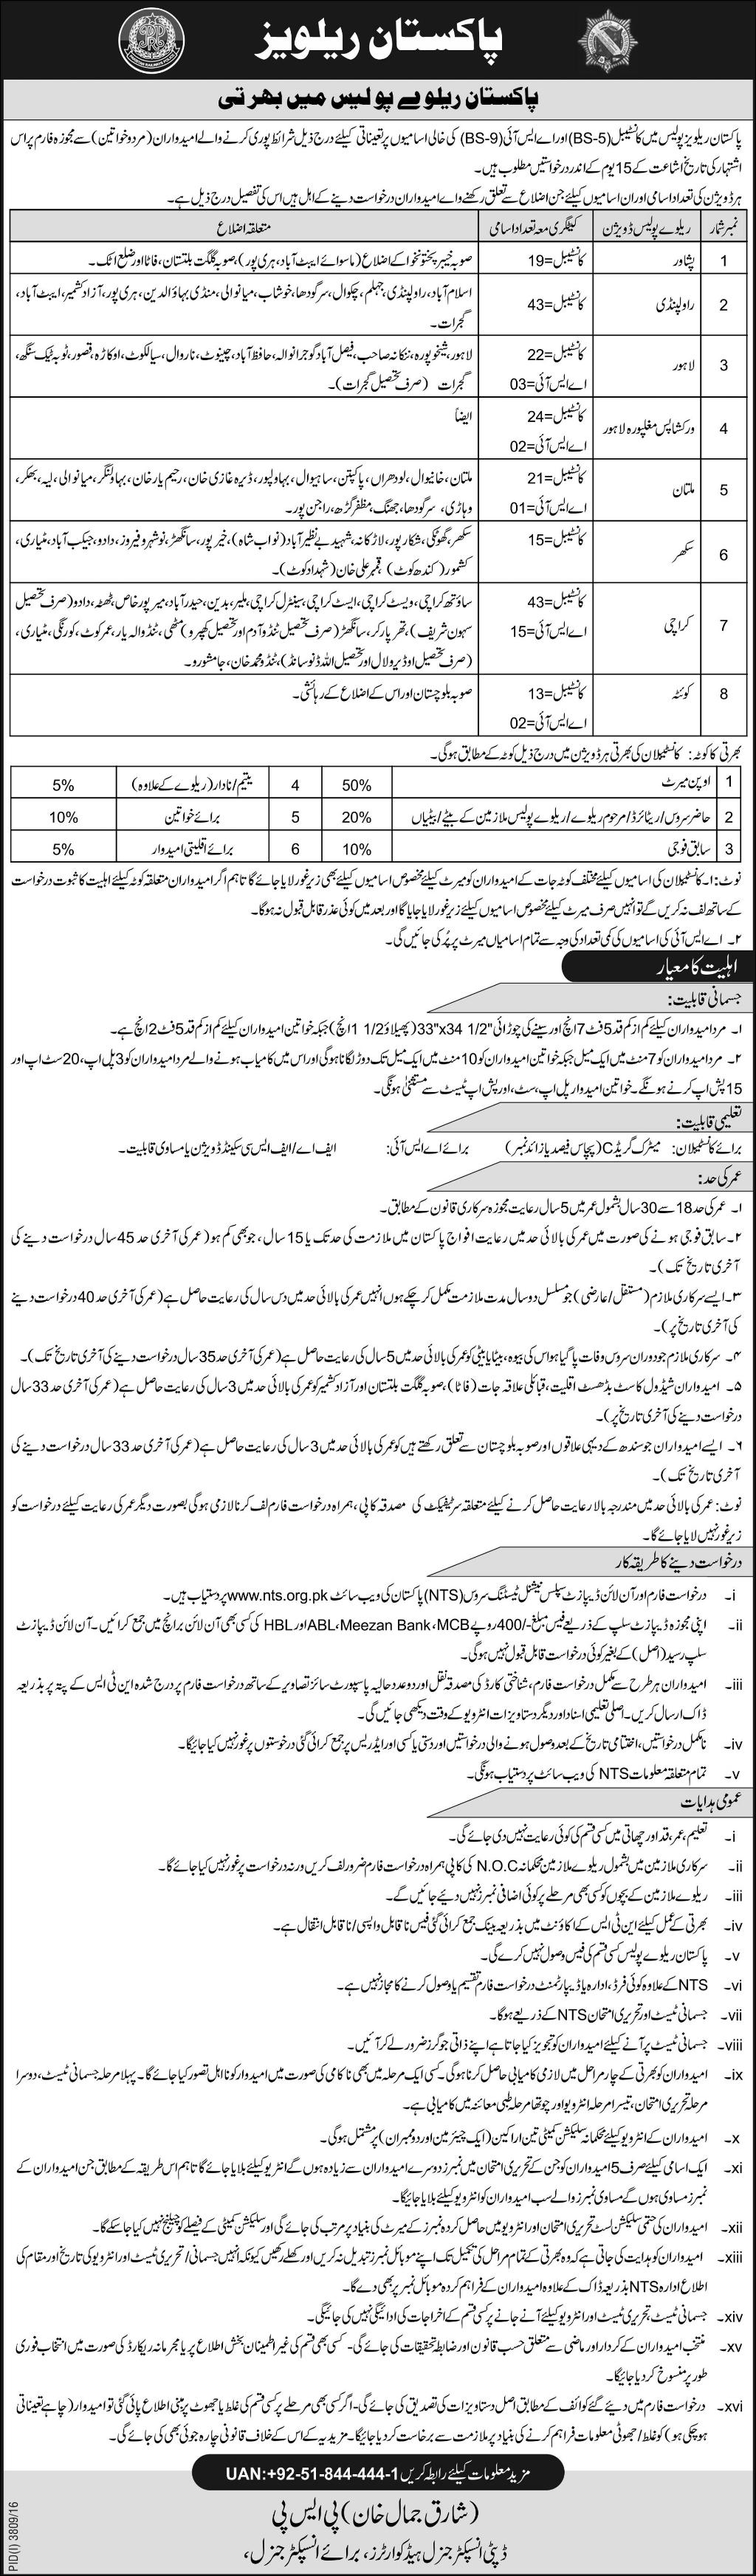 Pakistan Railway Police ASI, Constable Jobs 2017 Application Form